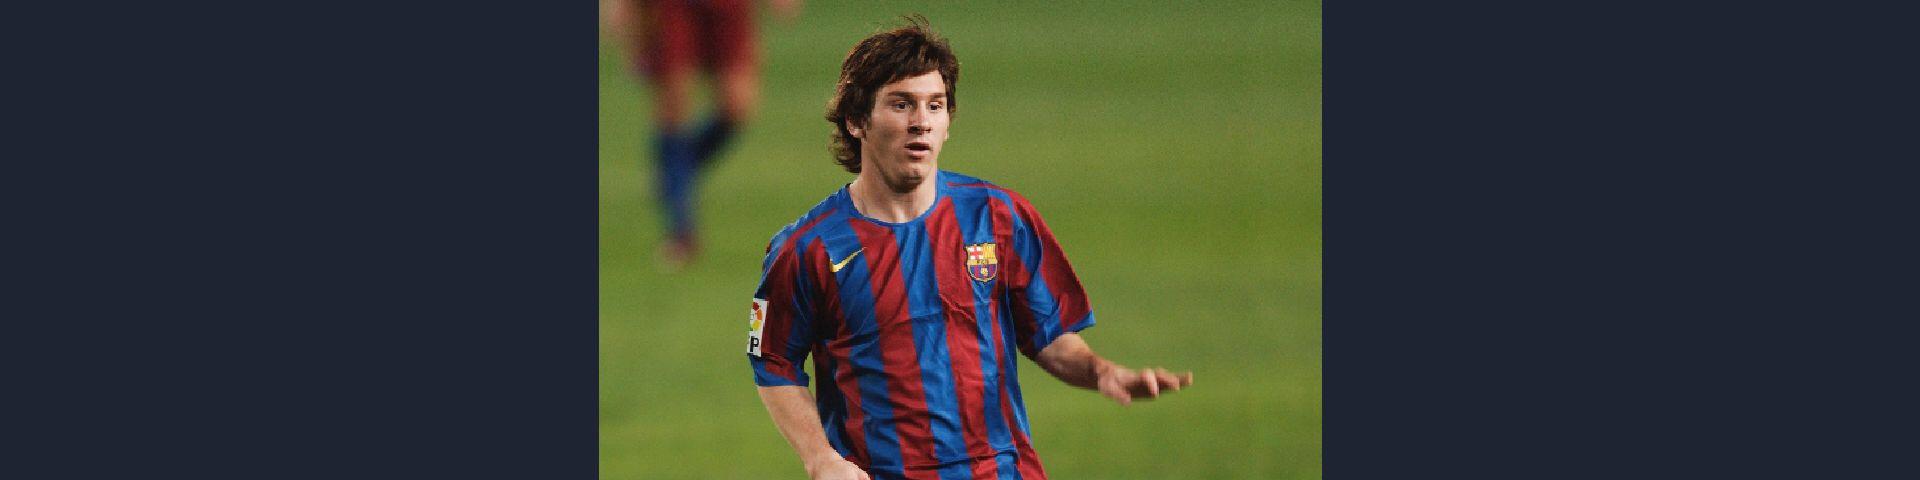 Top 5 Most Impressive Players In La Liga at the moment